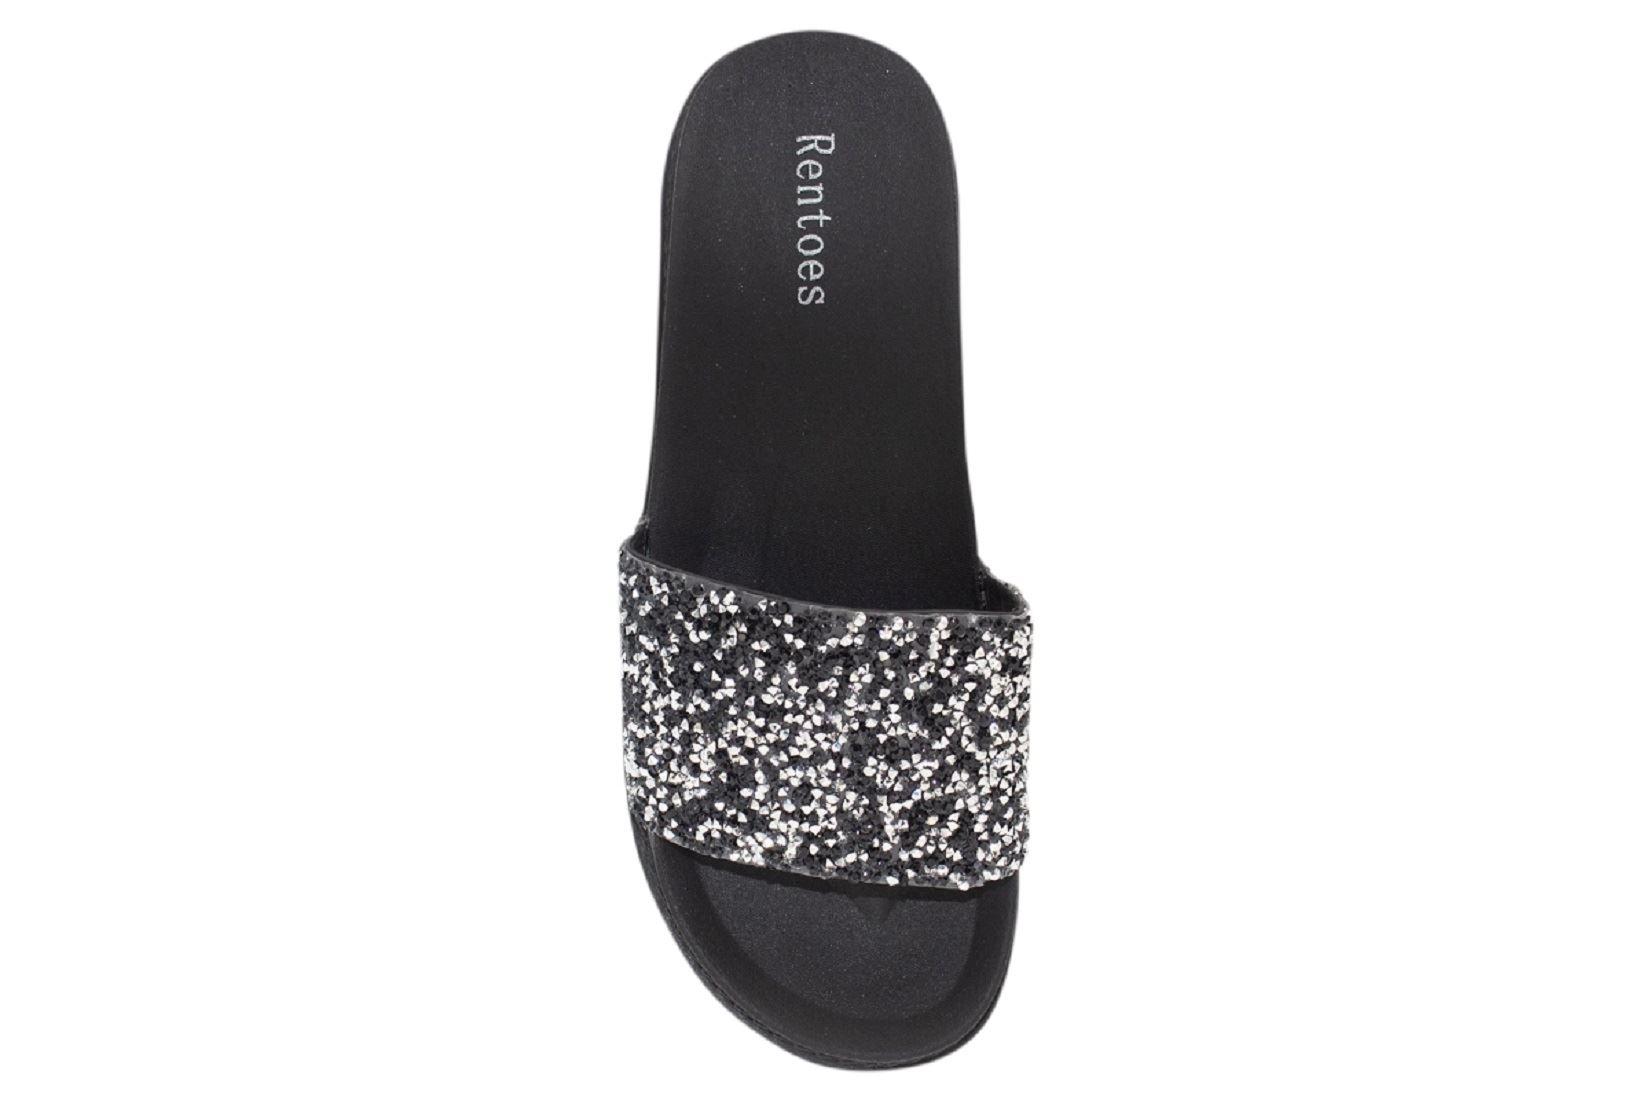 Womens-Sliders-Casual-Slippers-Mules-Ladies-Diamante-Flip-Flop-Sandals-Shoes thumbnail 85